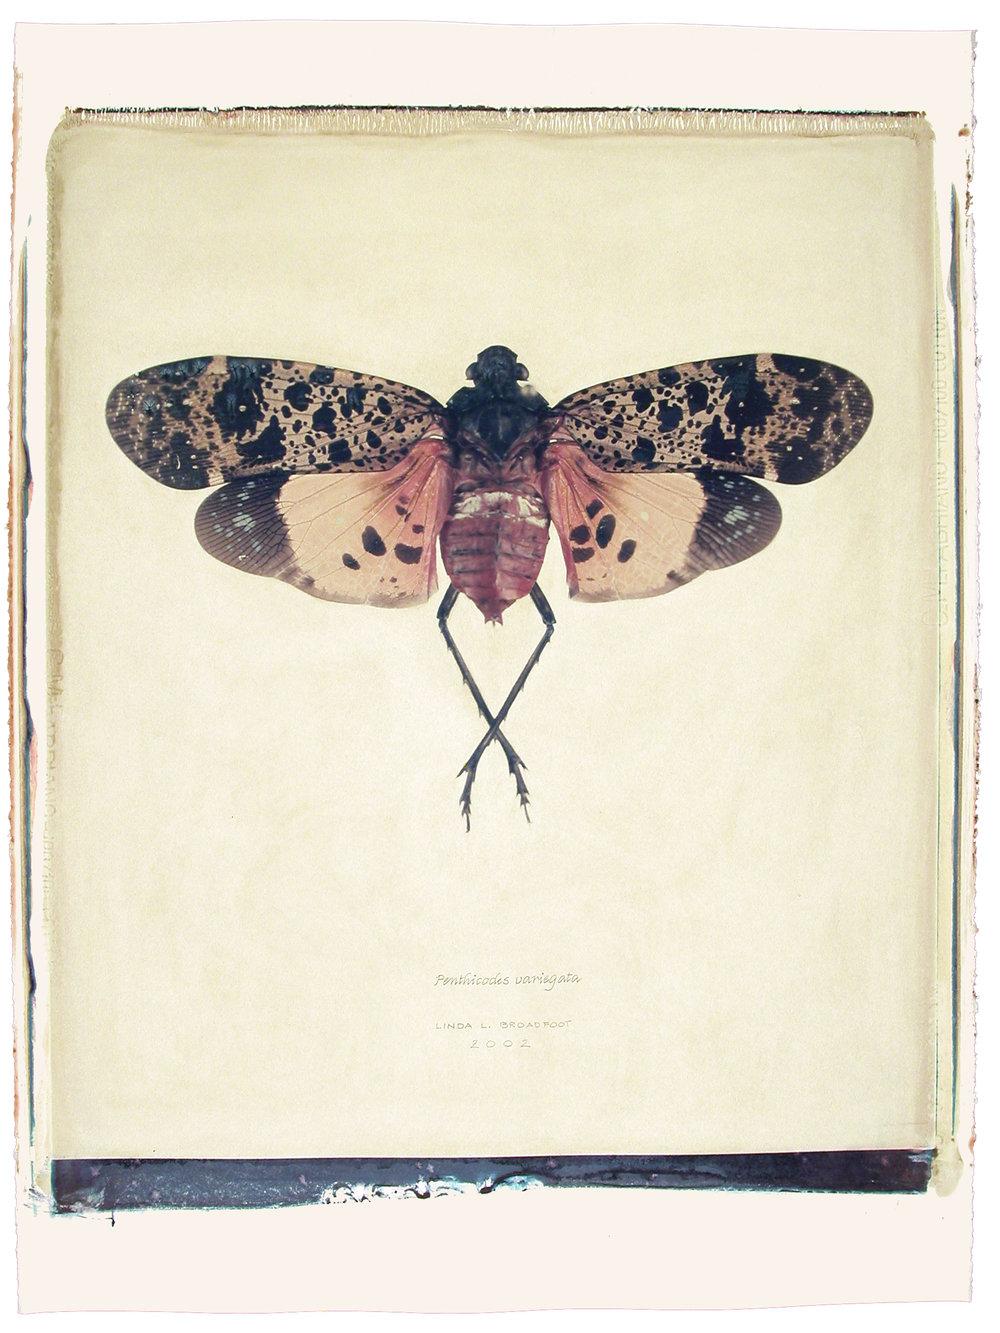 Penthicodes variegata  (Coat-of-Many-Colors Bug), 2002